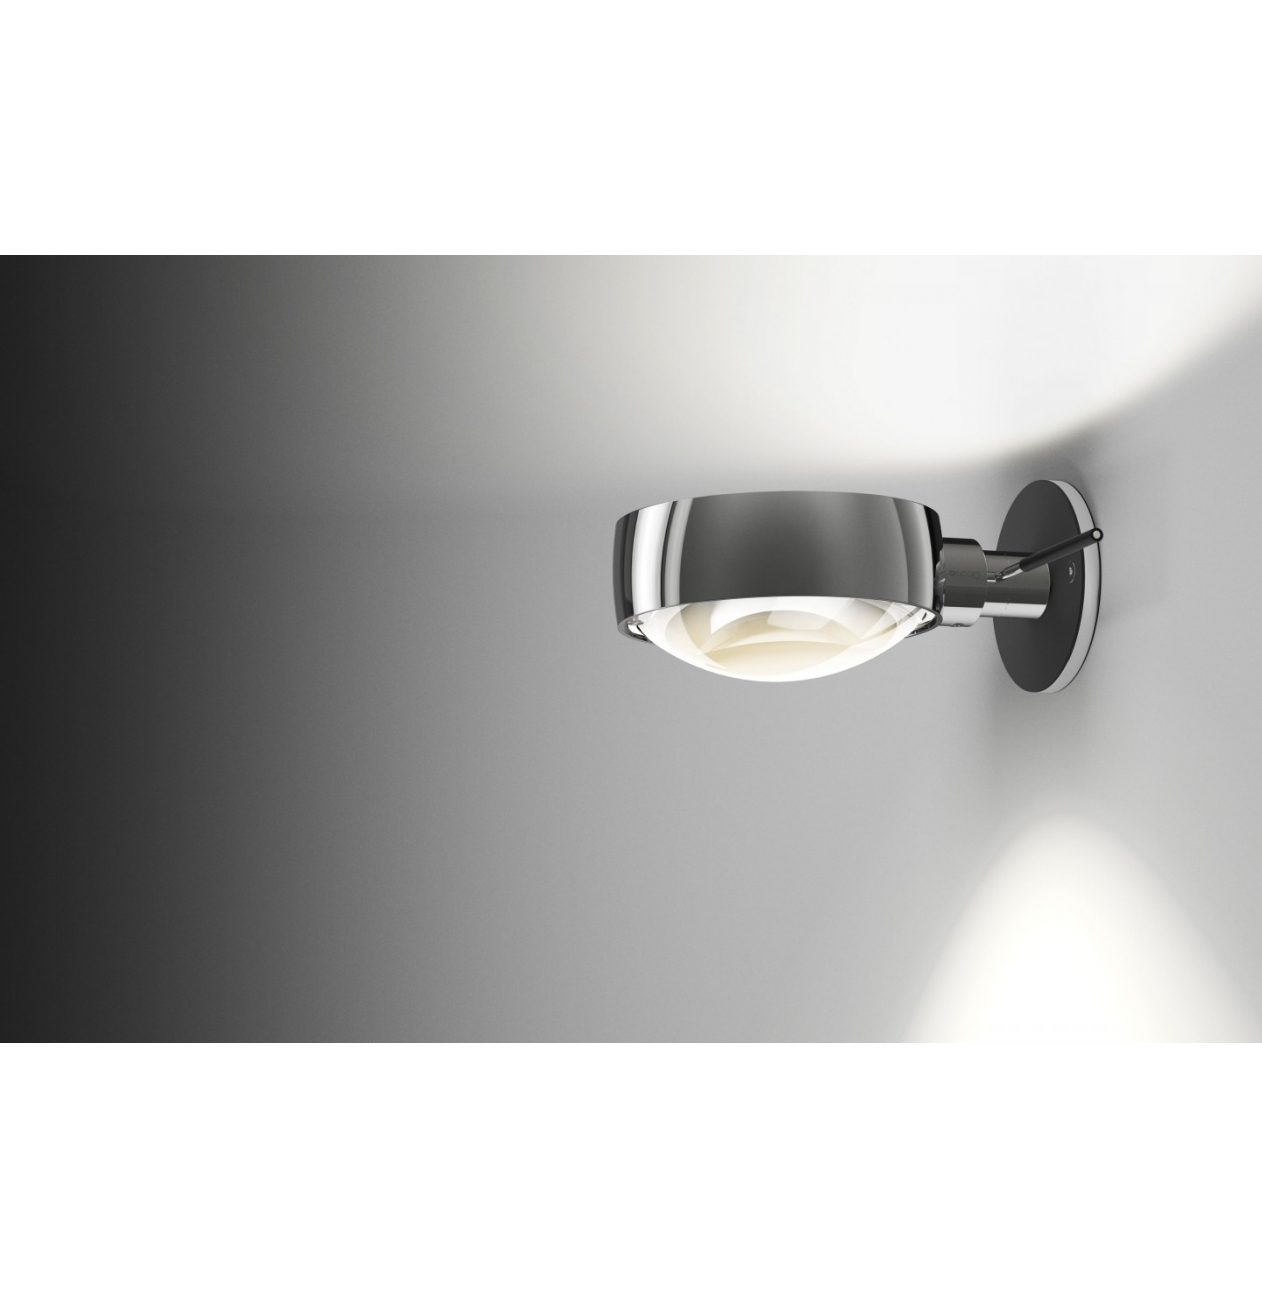 occhio wandlamp verticale sento e met extra mat glas versteeg lichtstudio. Black Bedroom Furniture Sets. Home Design Ideas